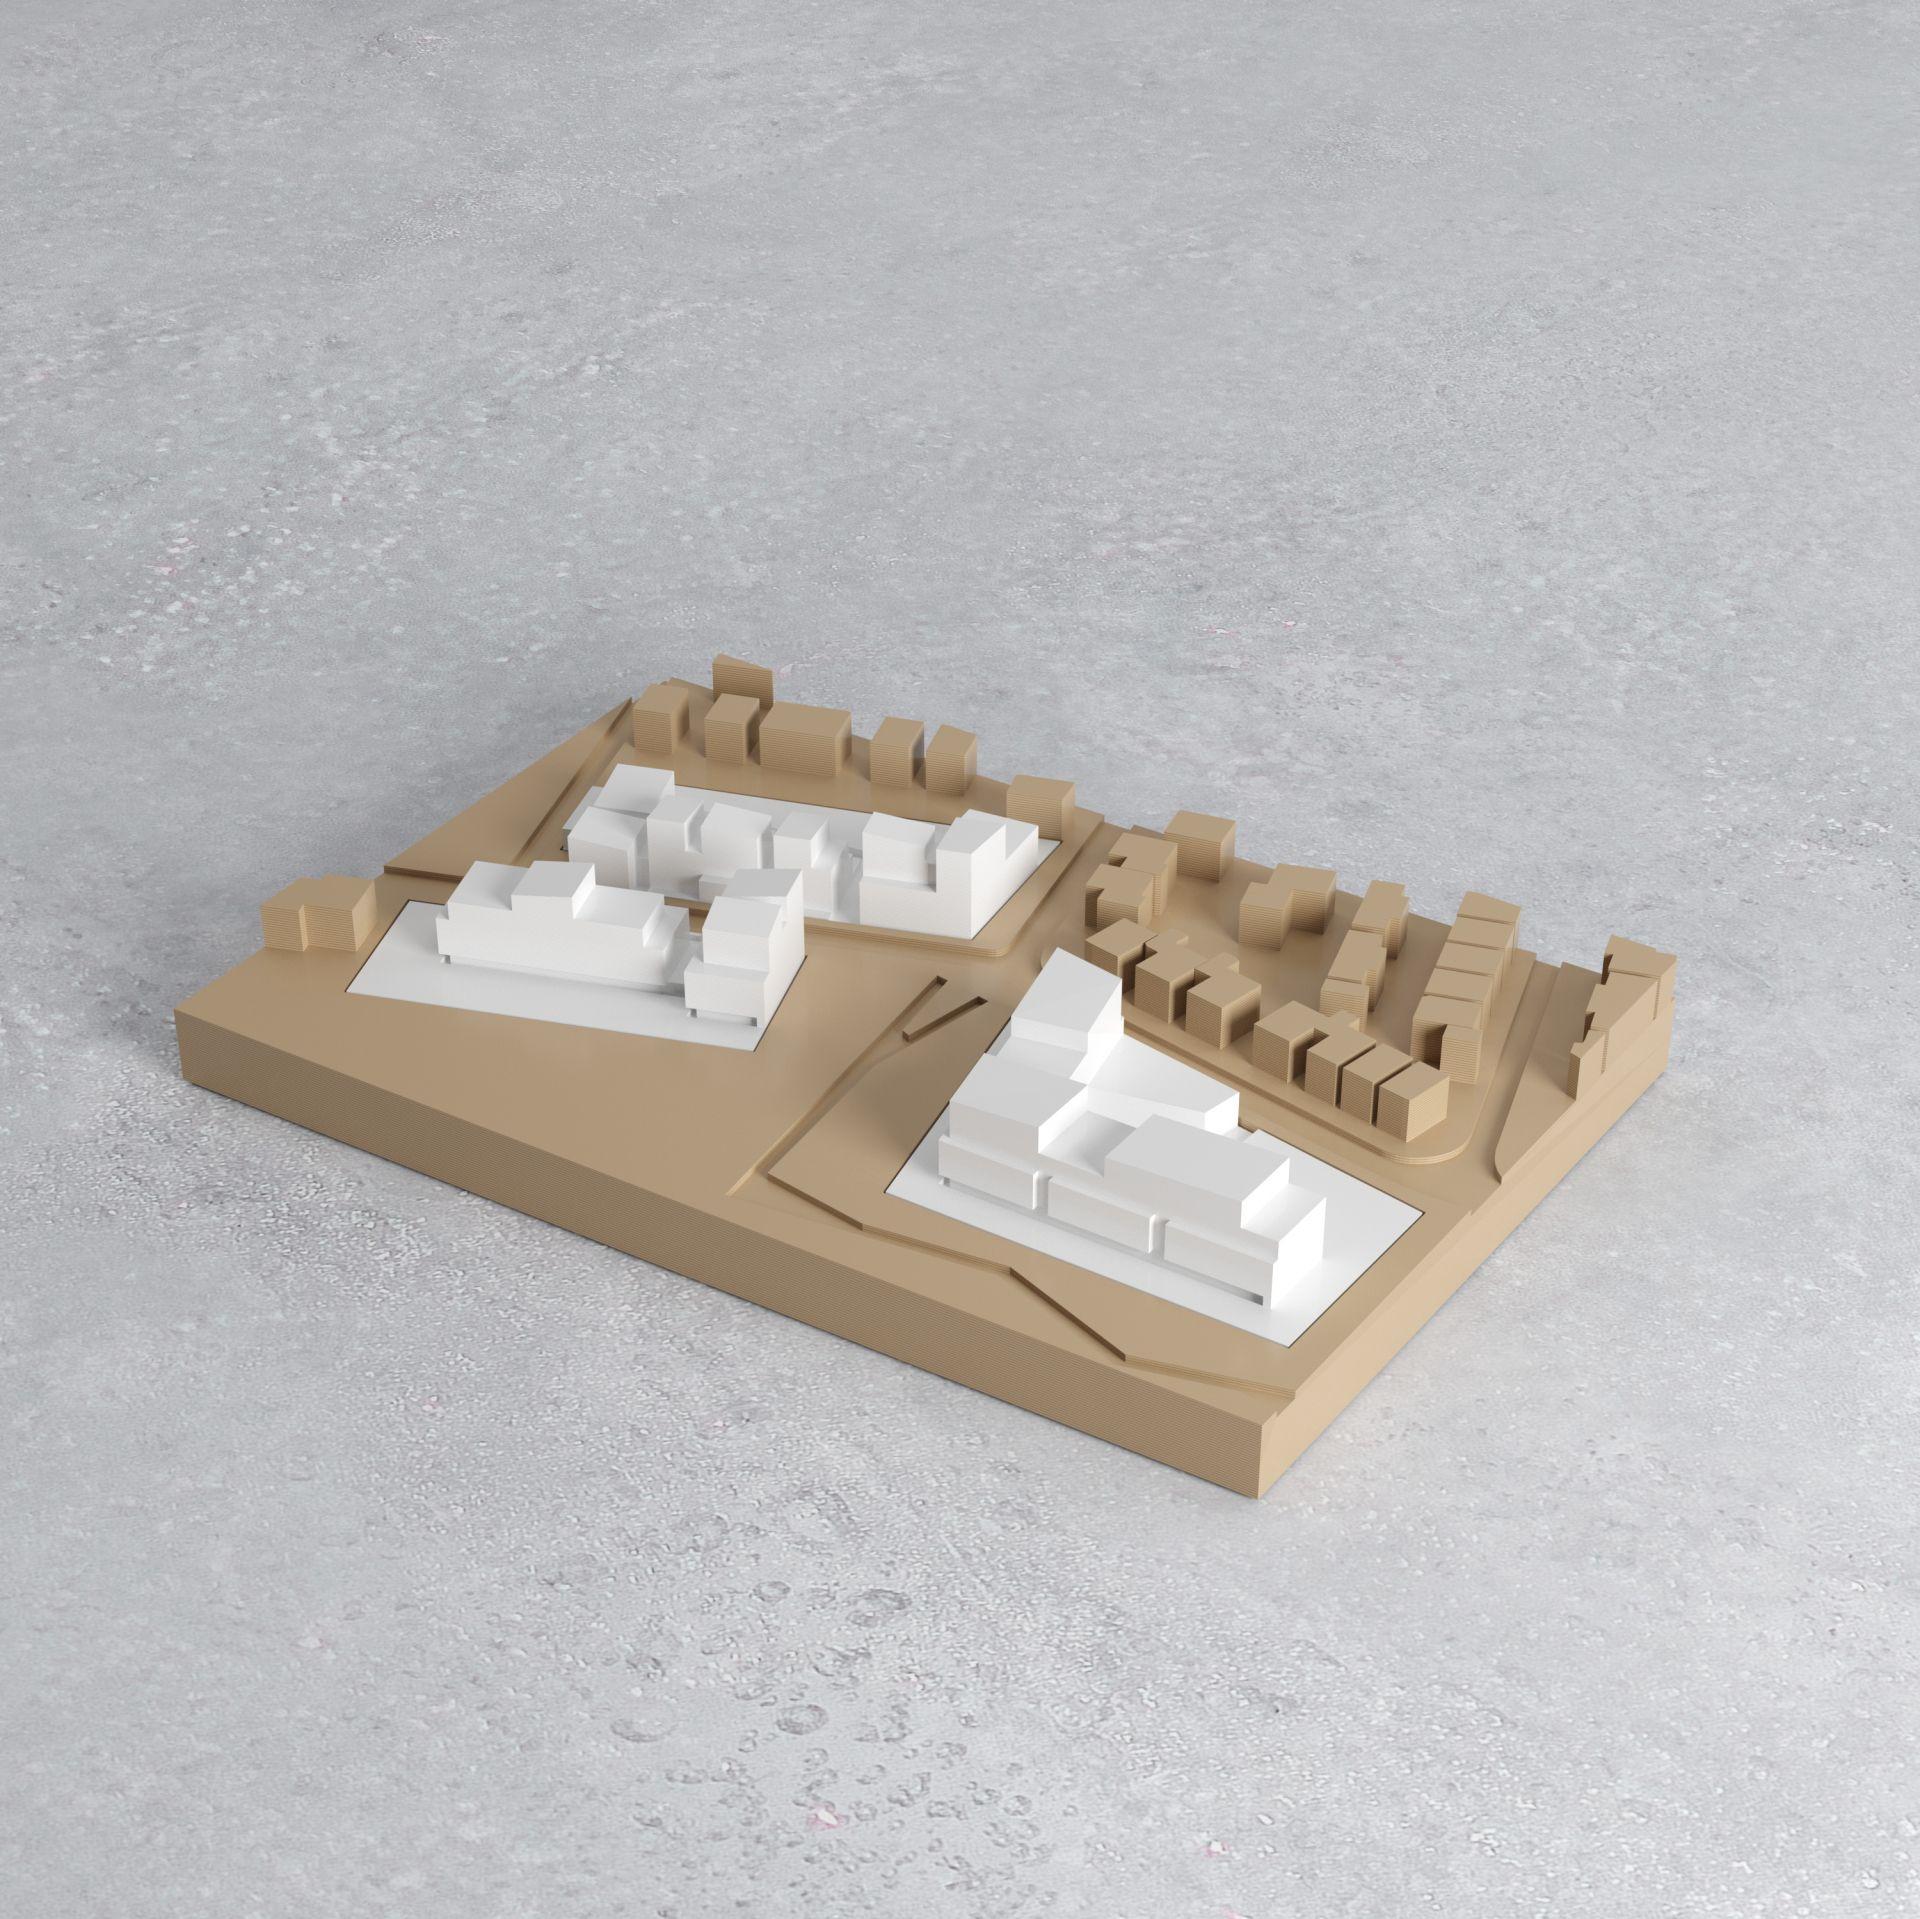 Supervue nakache orihuela architectes lgt bruyere le chatel maquetteMedium